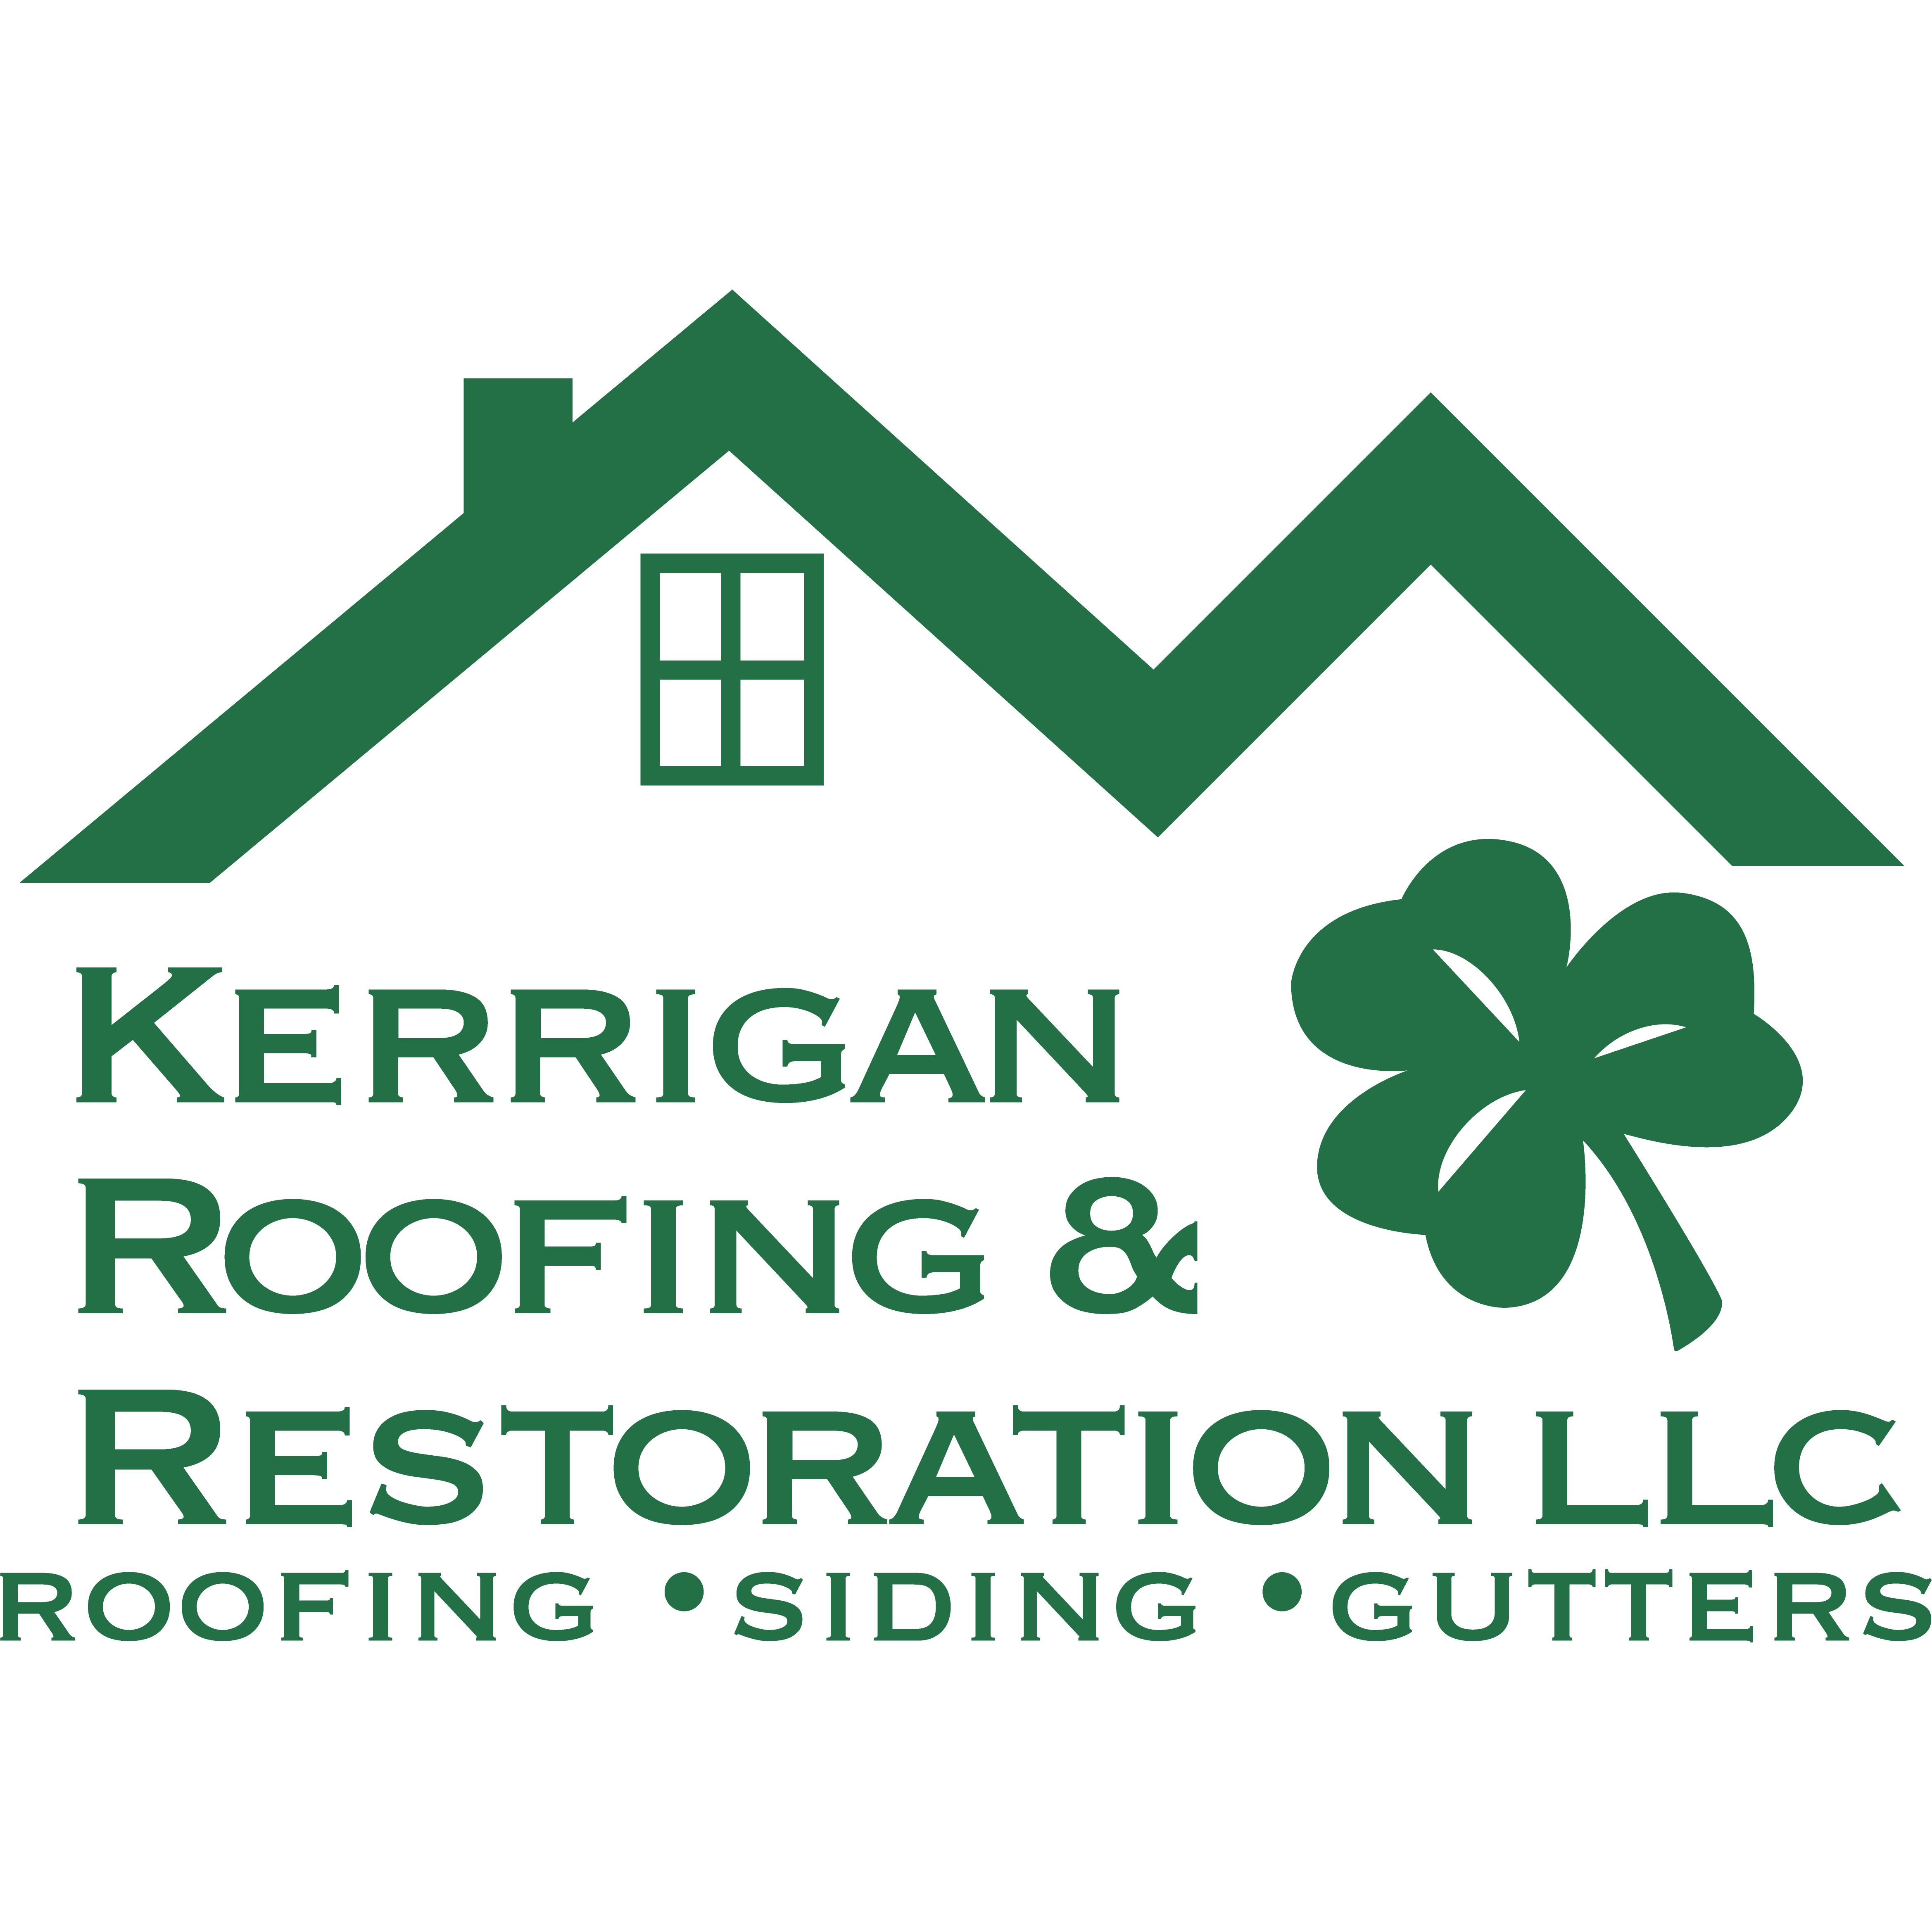 Kerrigan Roofing and Restoration